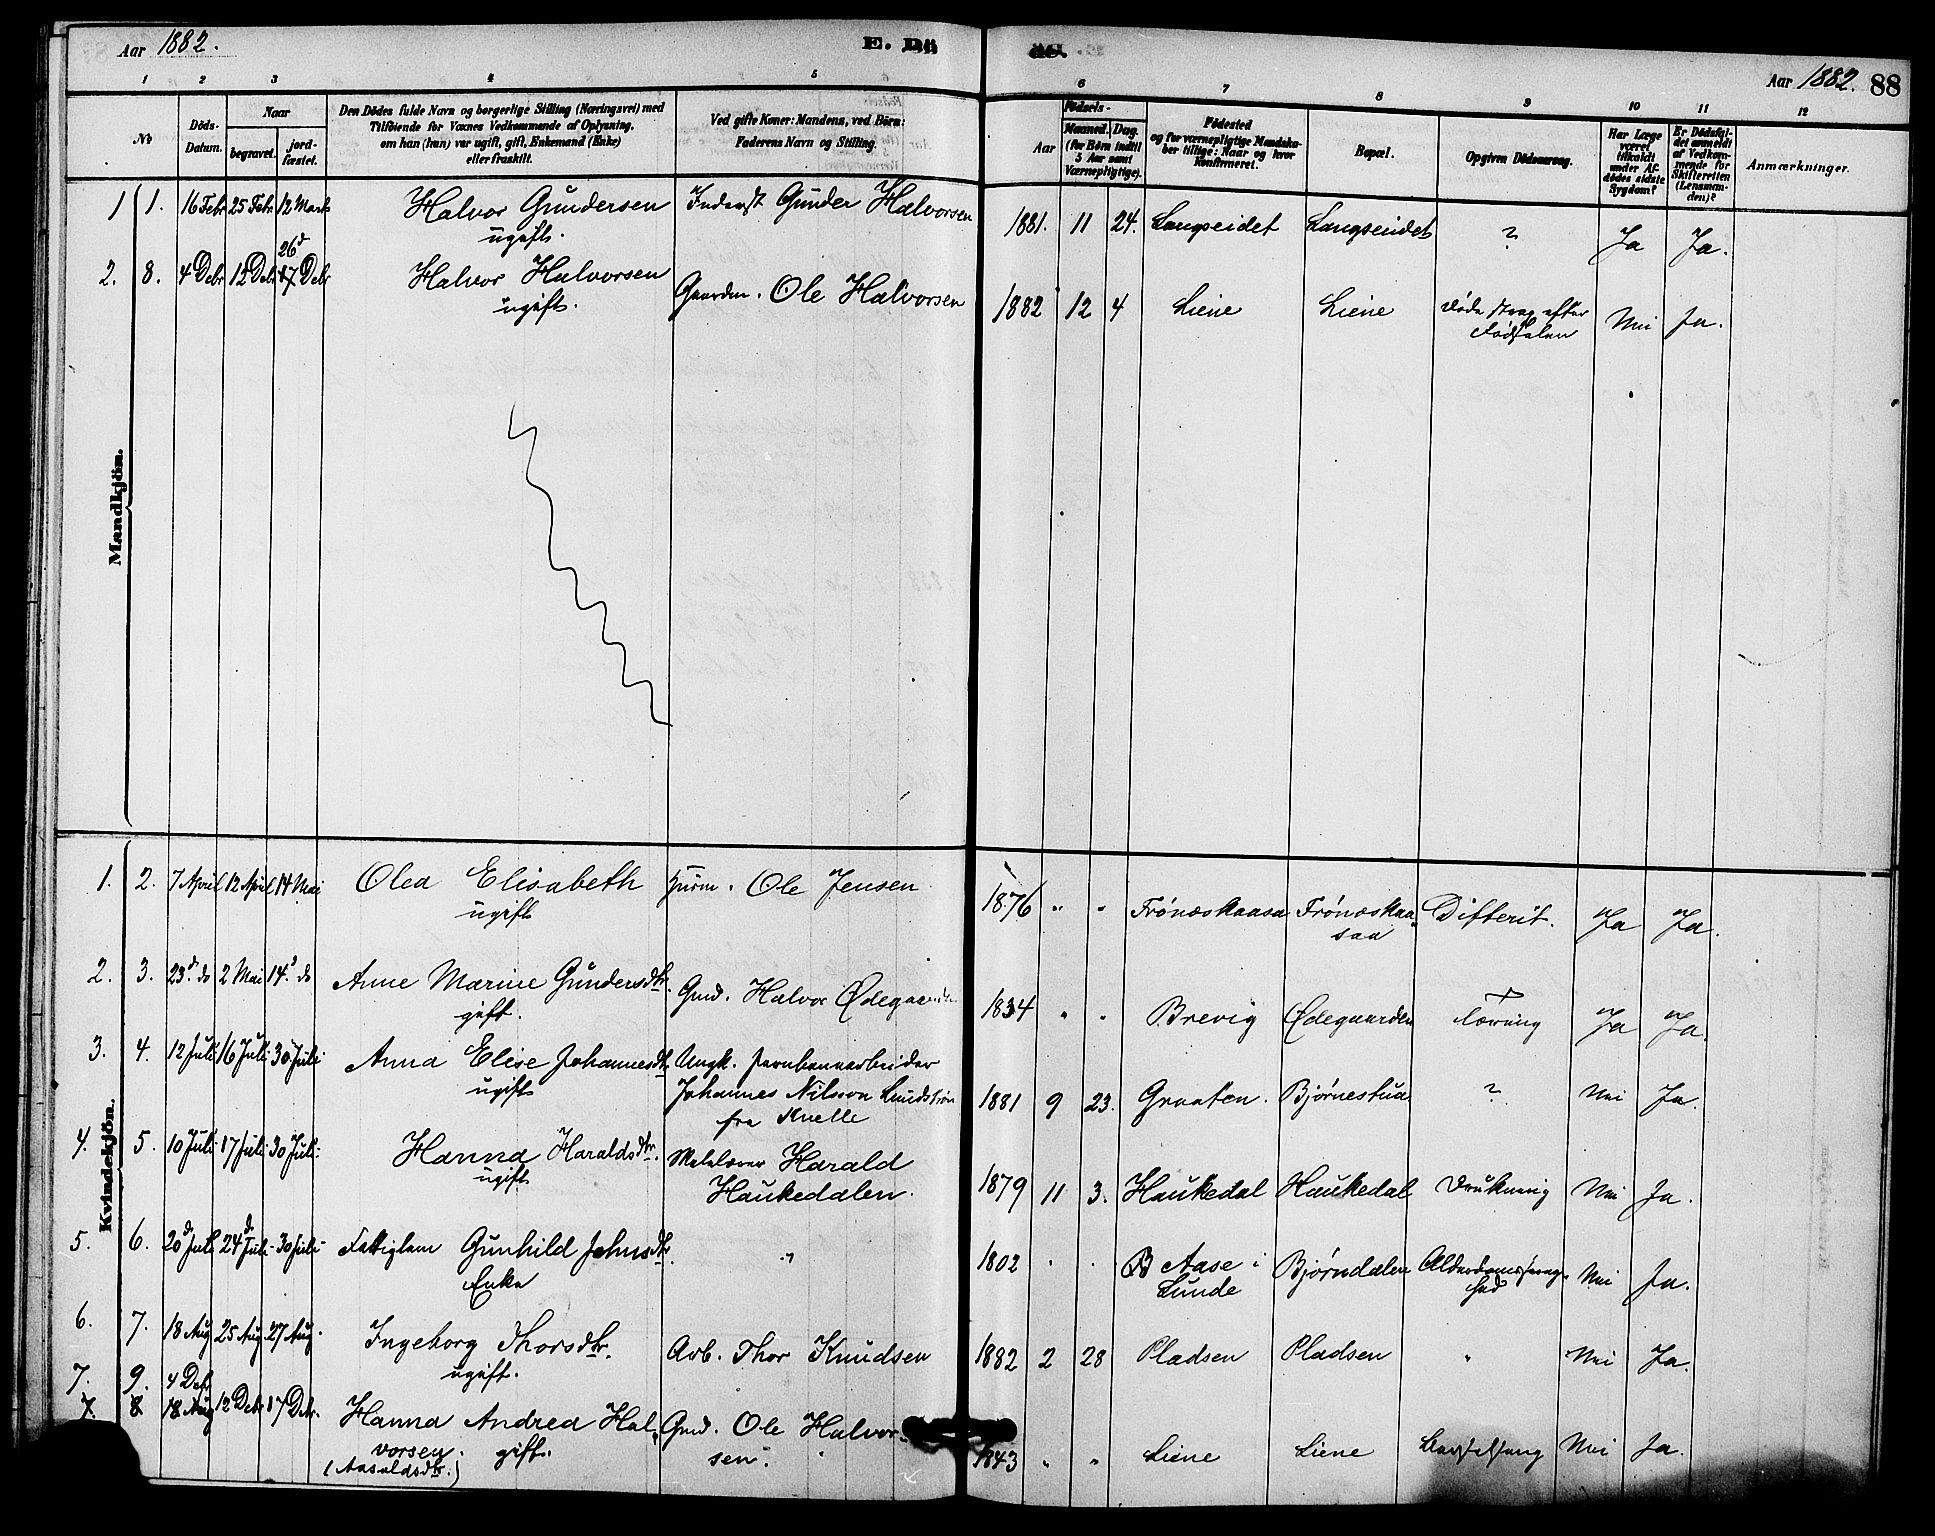 SAKO, Solum kirkebøker, F/Fc/L0001: Ministerialbok nr. III 1, 1877-1891, s. 88